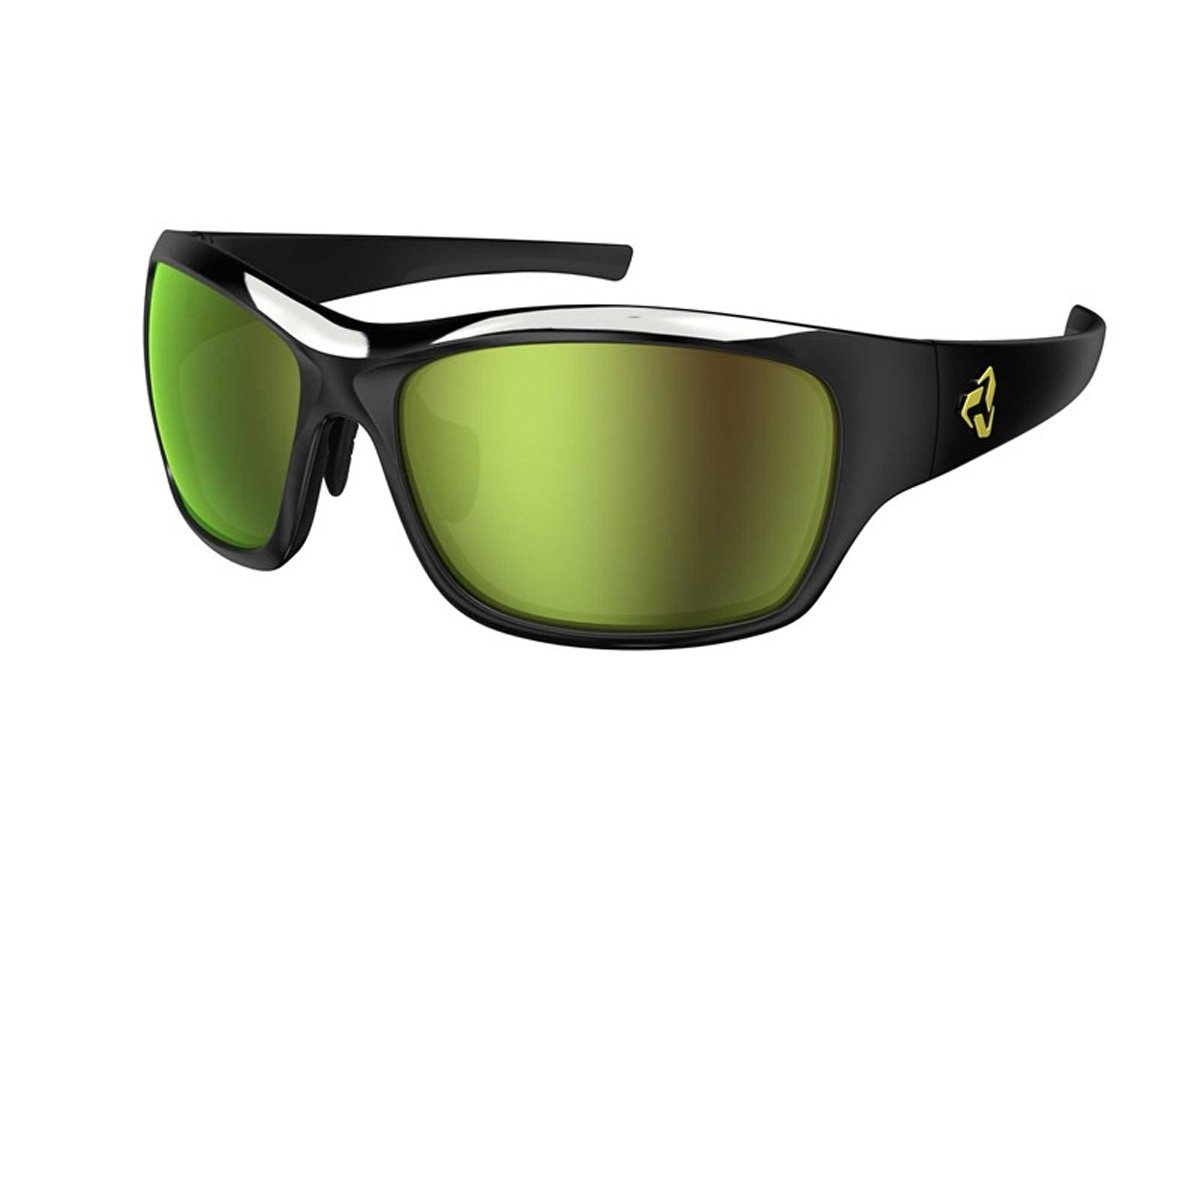 c92b47f9ed1 Amazon.com   Ryders Eyewear Khyber Standard Sunglasses - 2-Tone  (Black-Gold Green Lens Gold FM)   Sports   Outdoors